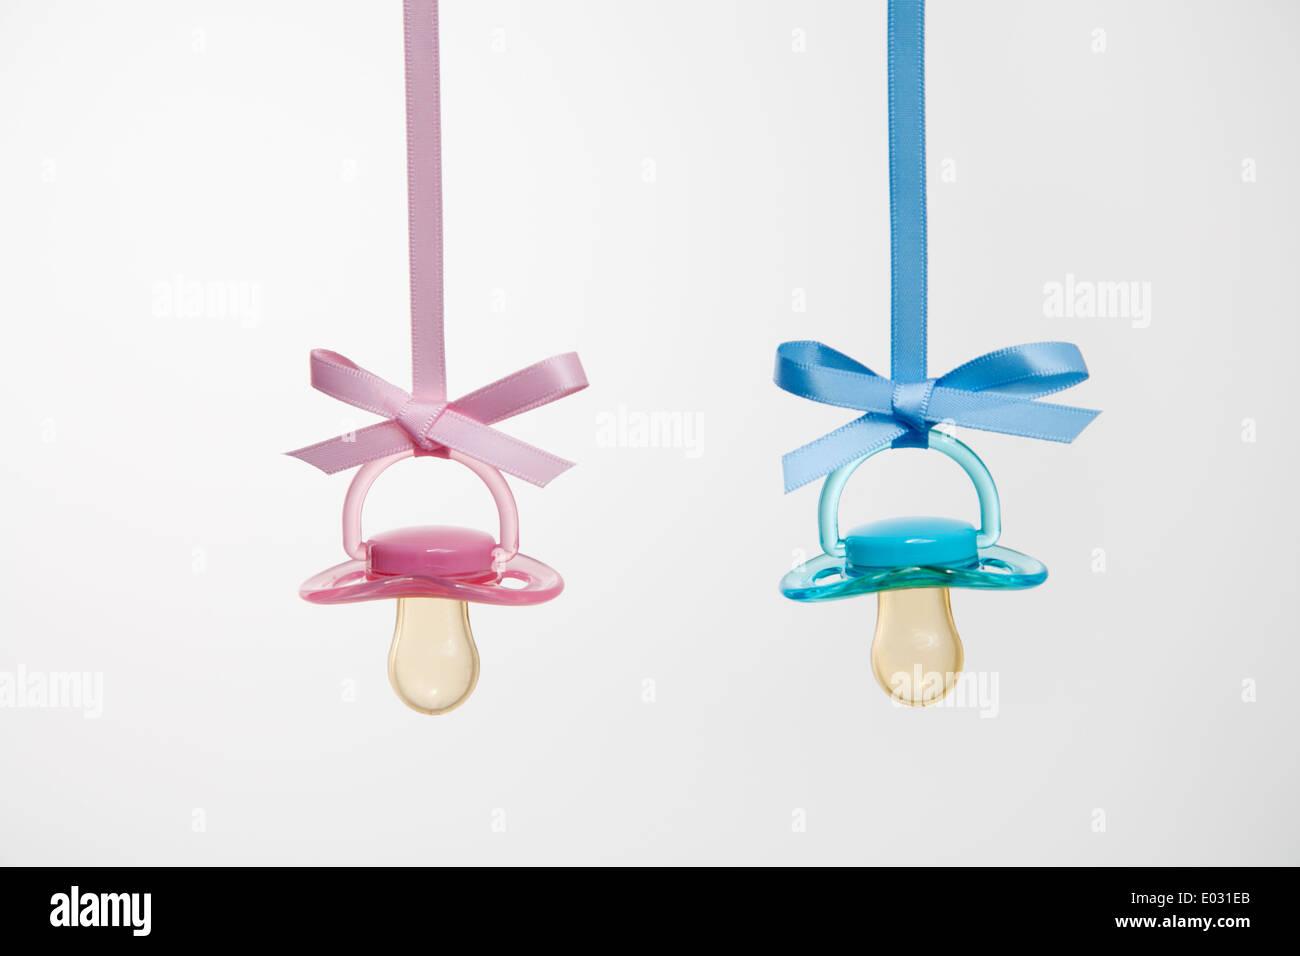 Bebé Chupetes colgados de cintas contra un fondo liso. Imagen De Stock